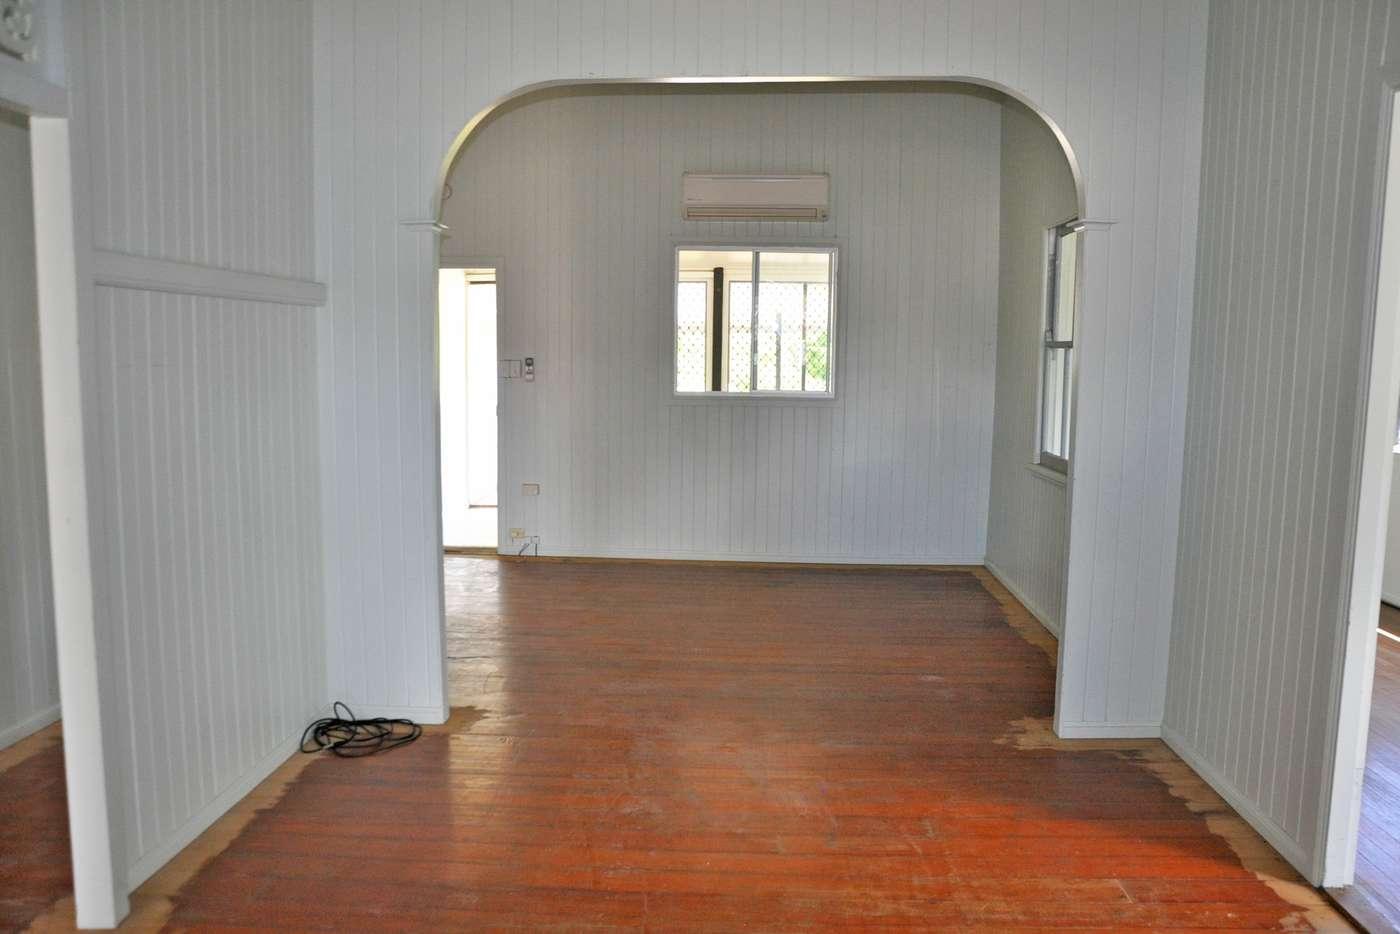 Sixth view of Homely house listing, 32 Strattmann Street, Mareeba QLD 4880